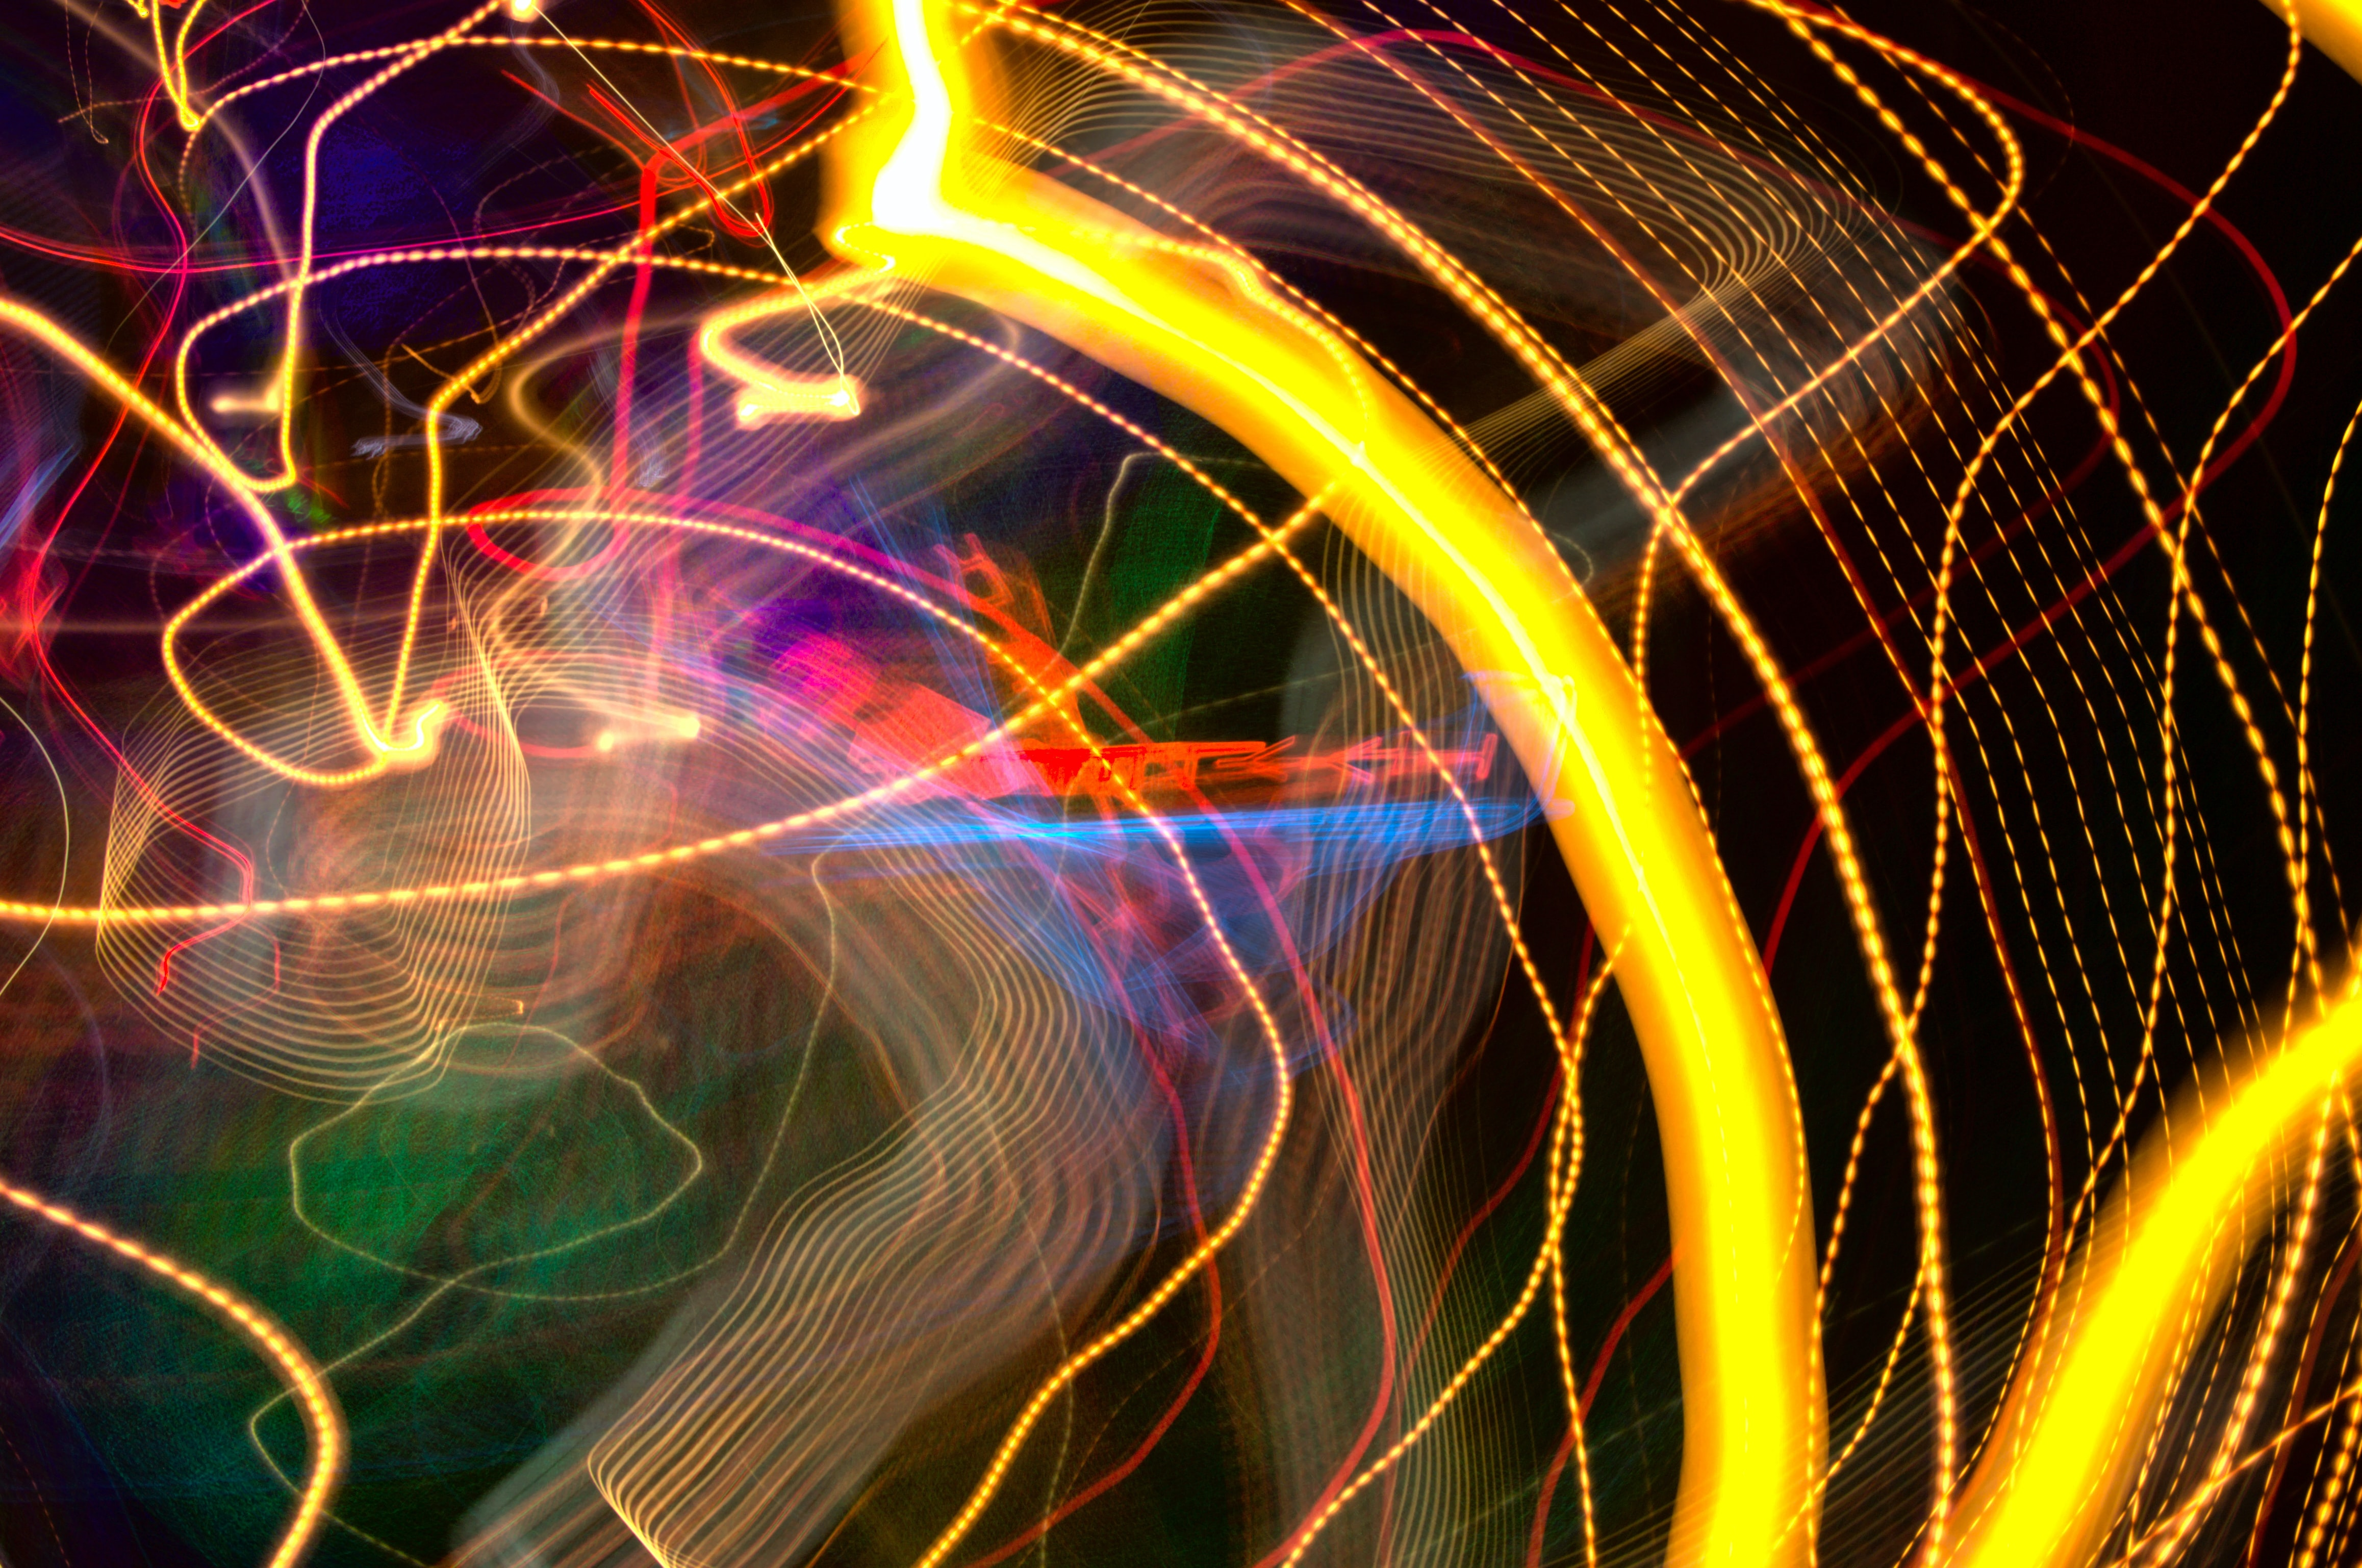 Fondos de pantalla Luces neon en movimiento